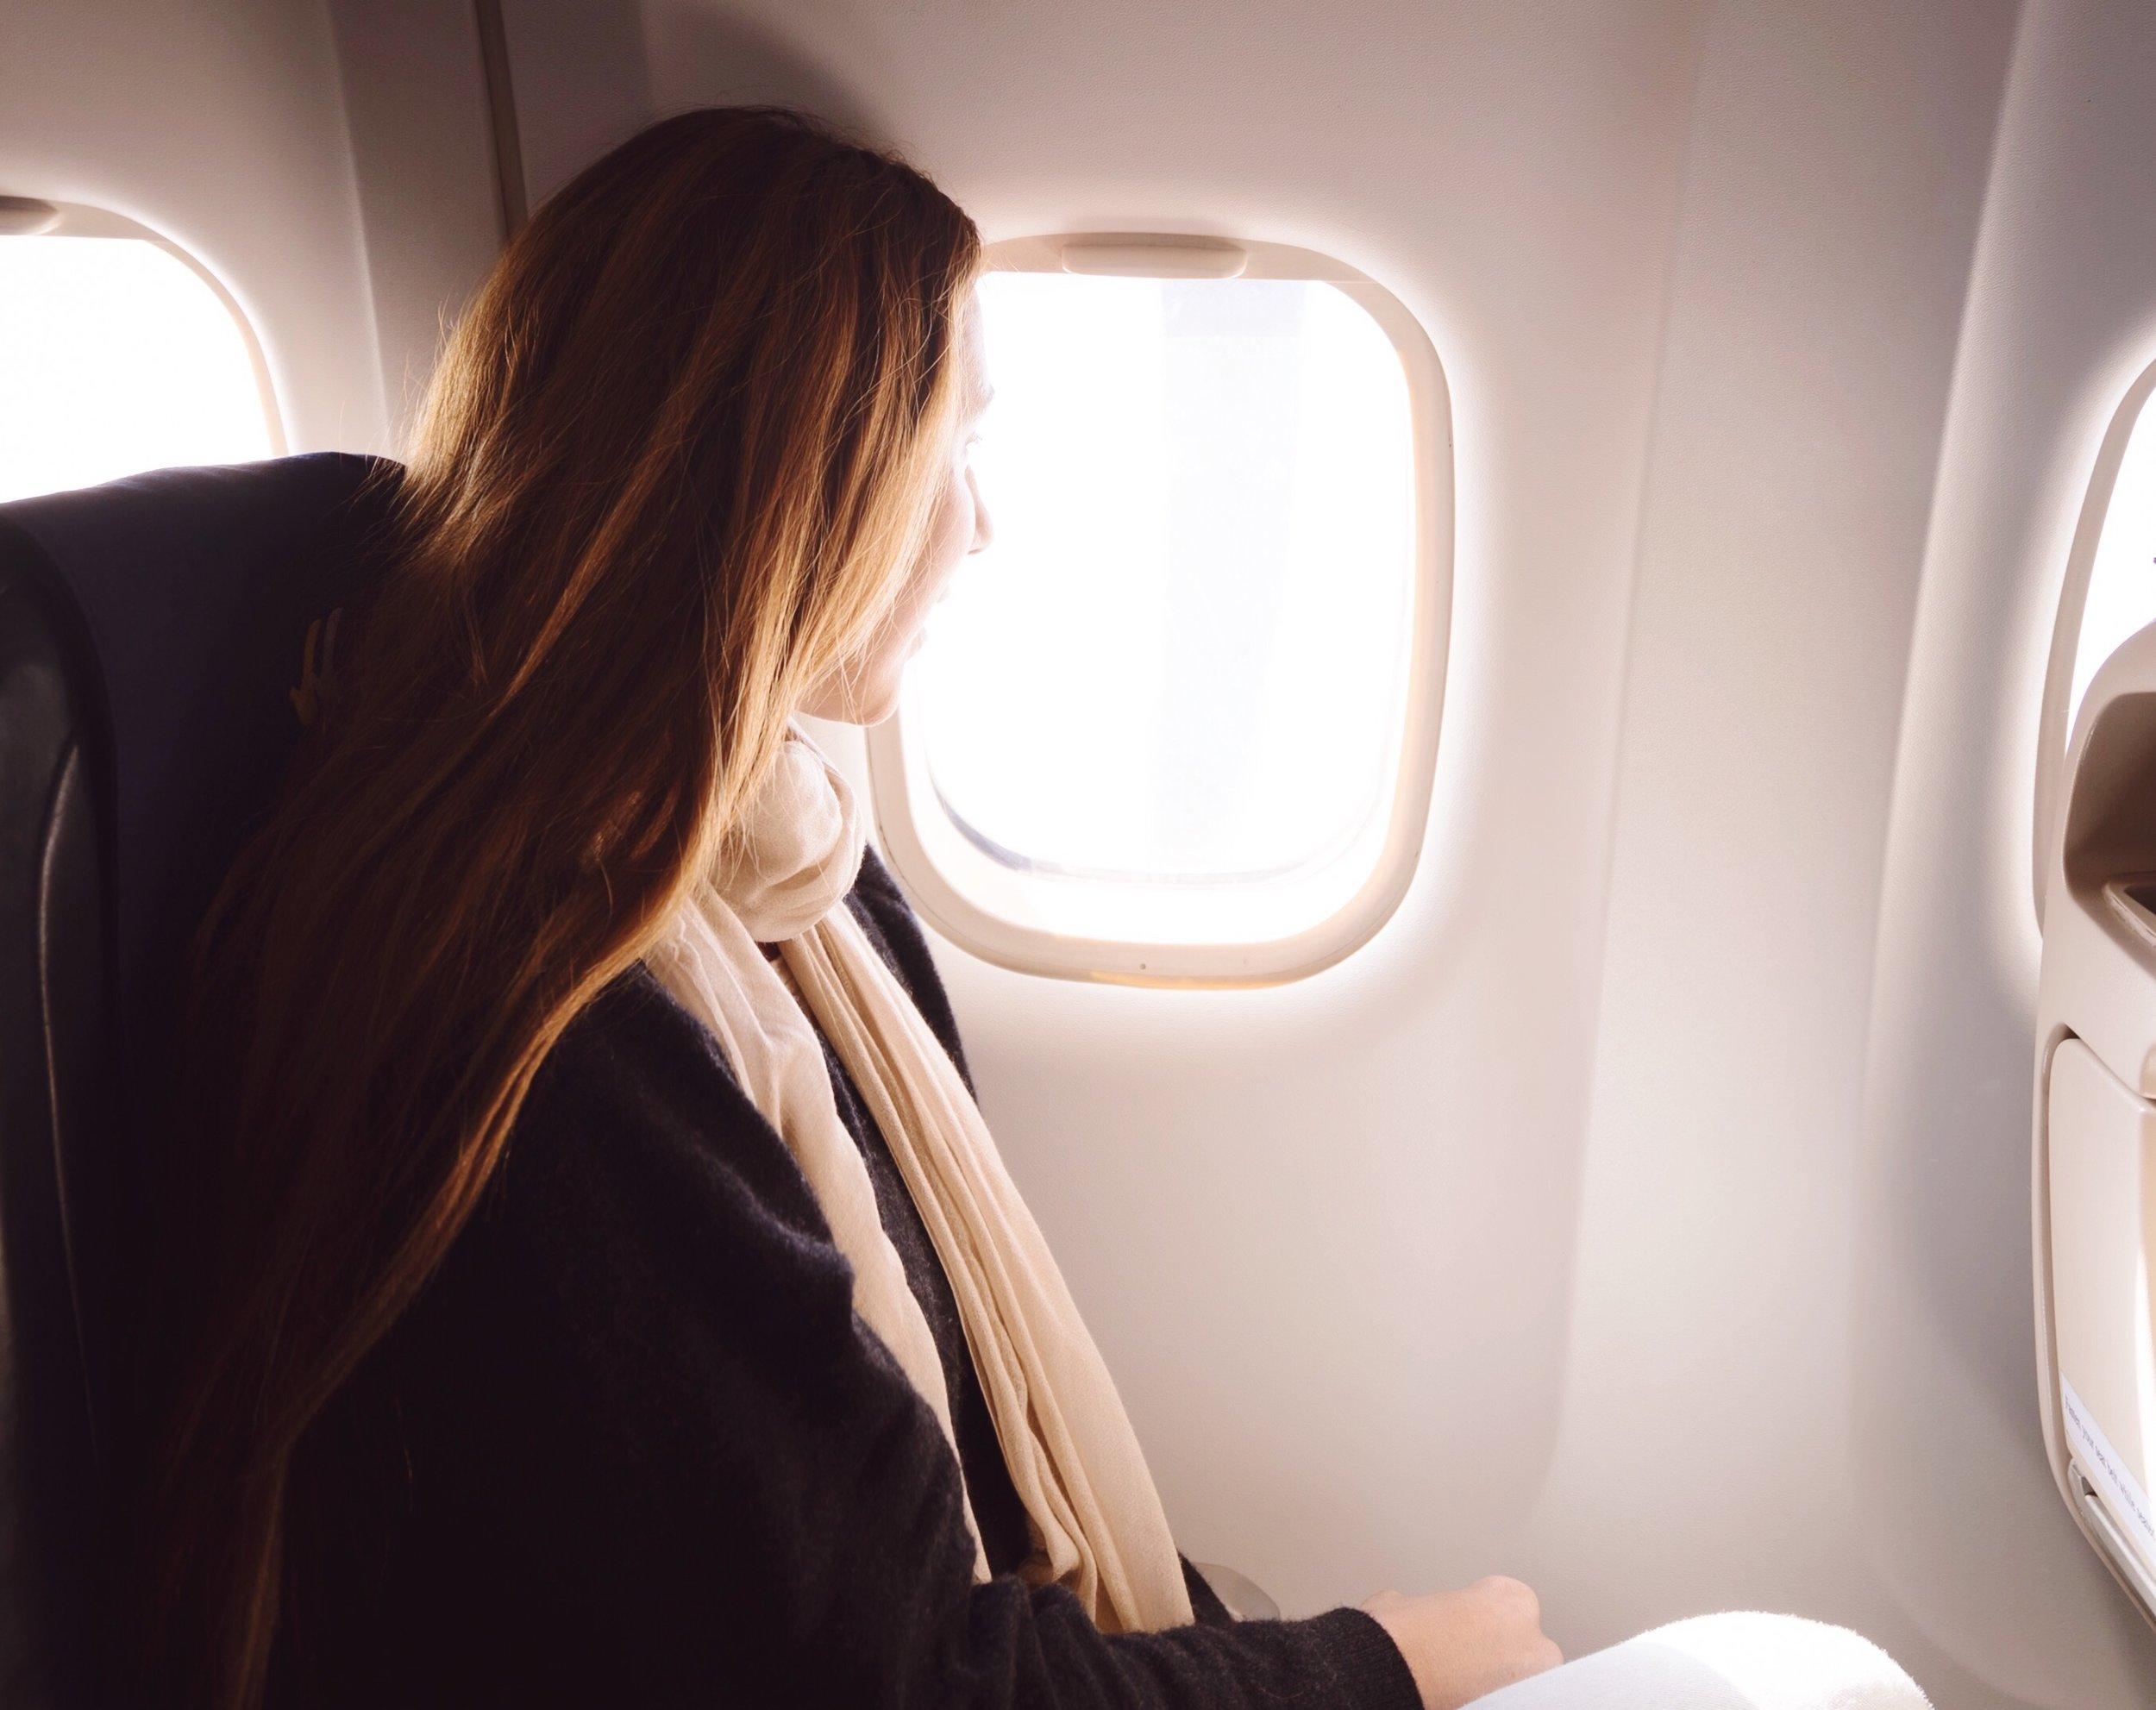 window seat selfish or smart telegraph trusted travel girl